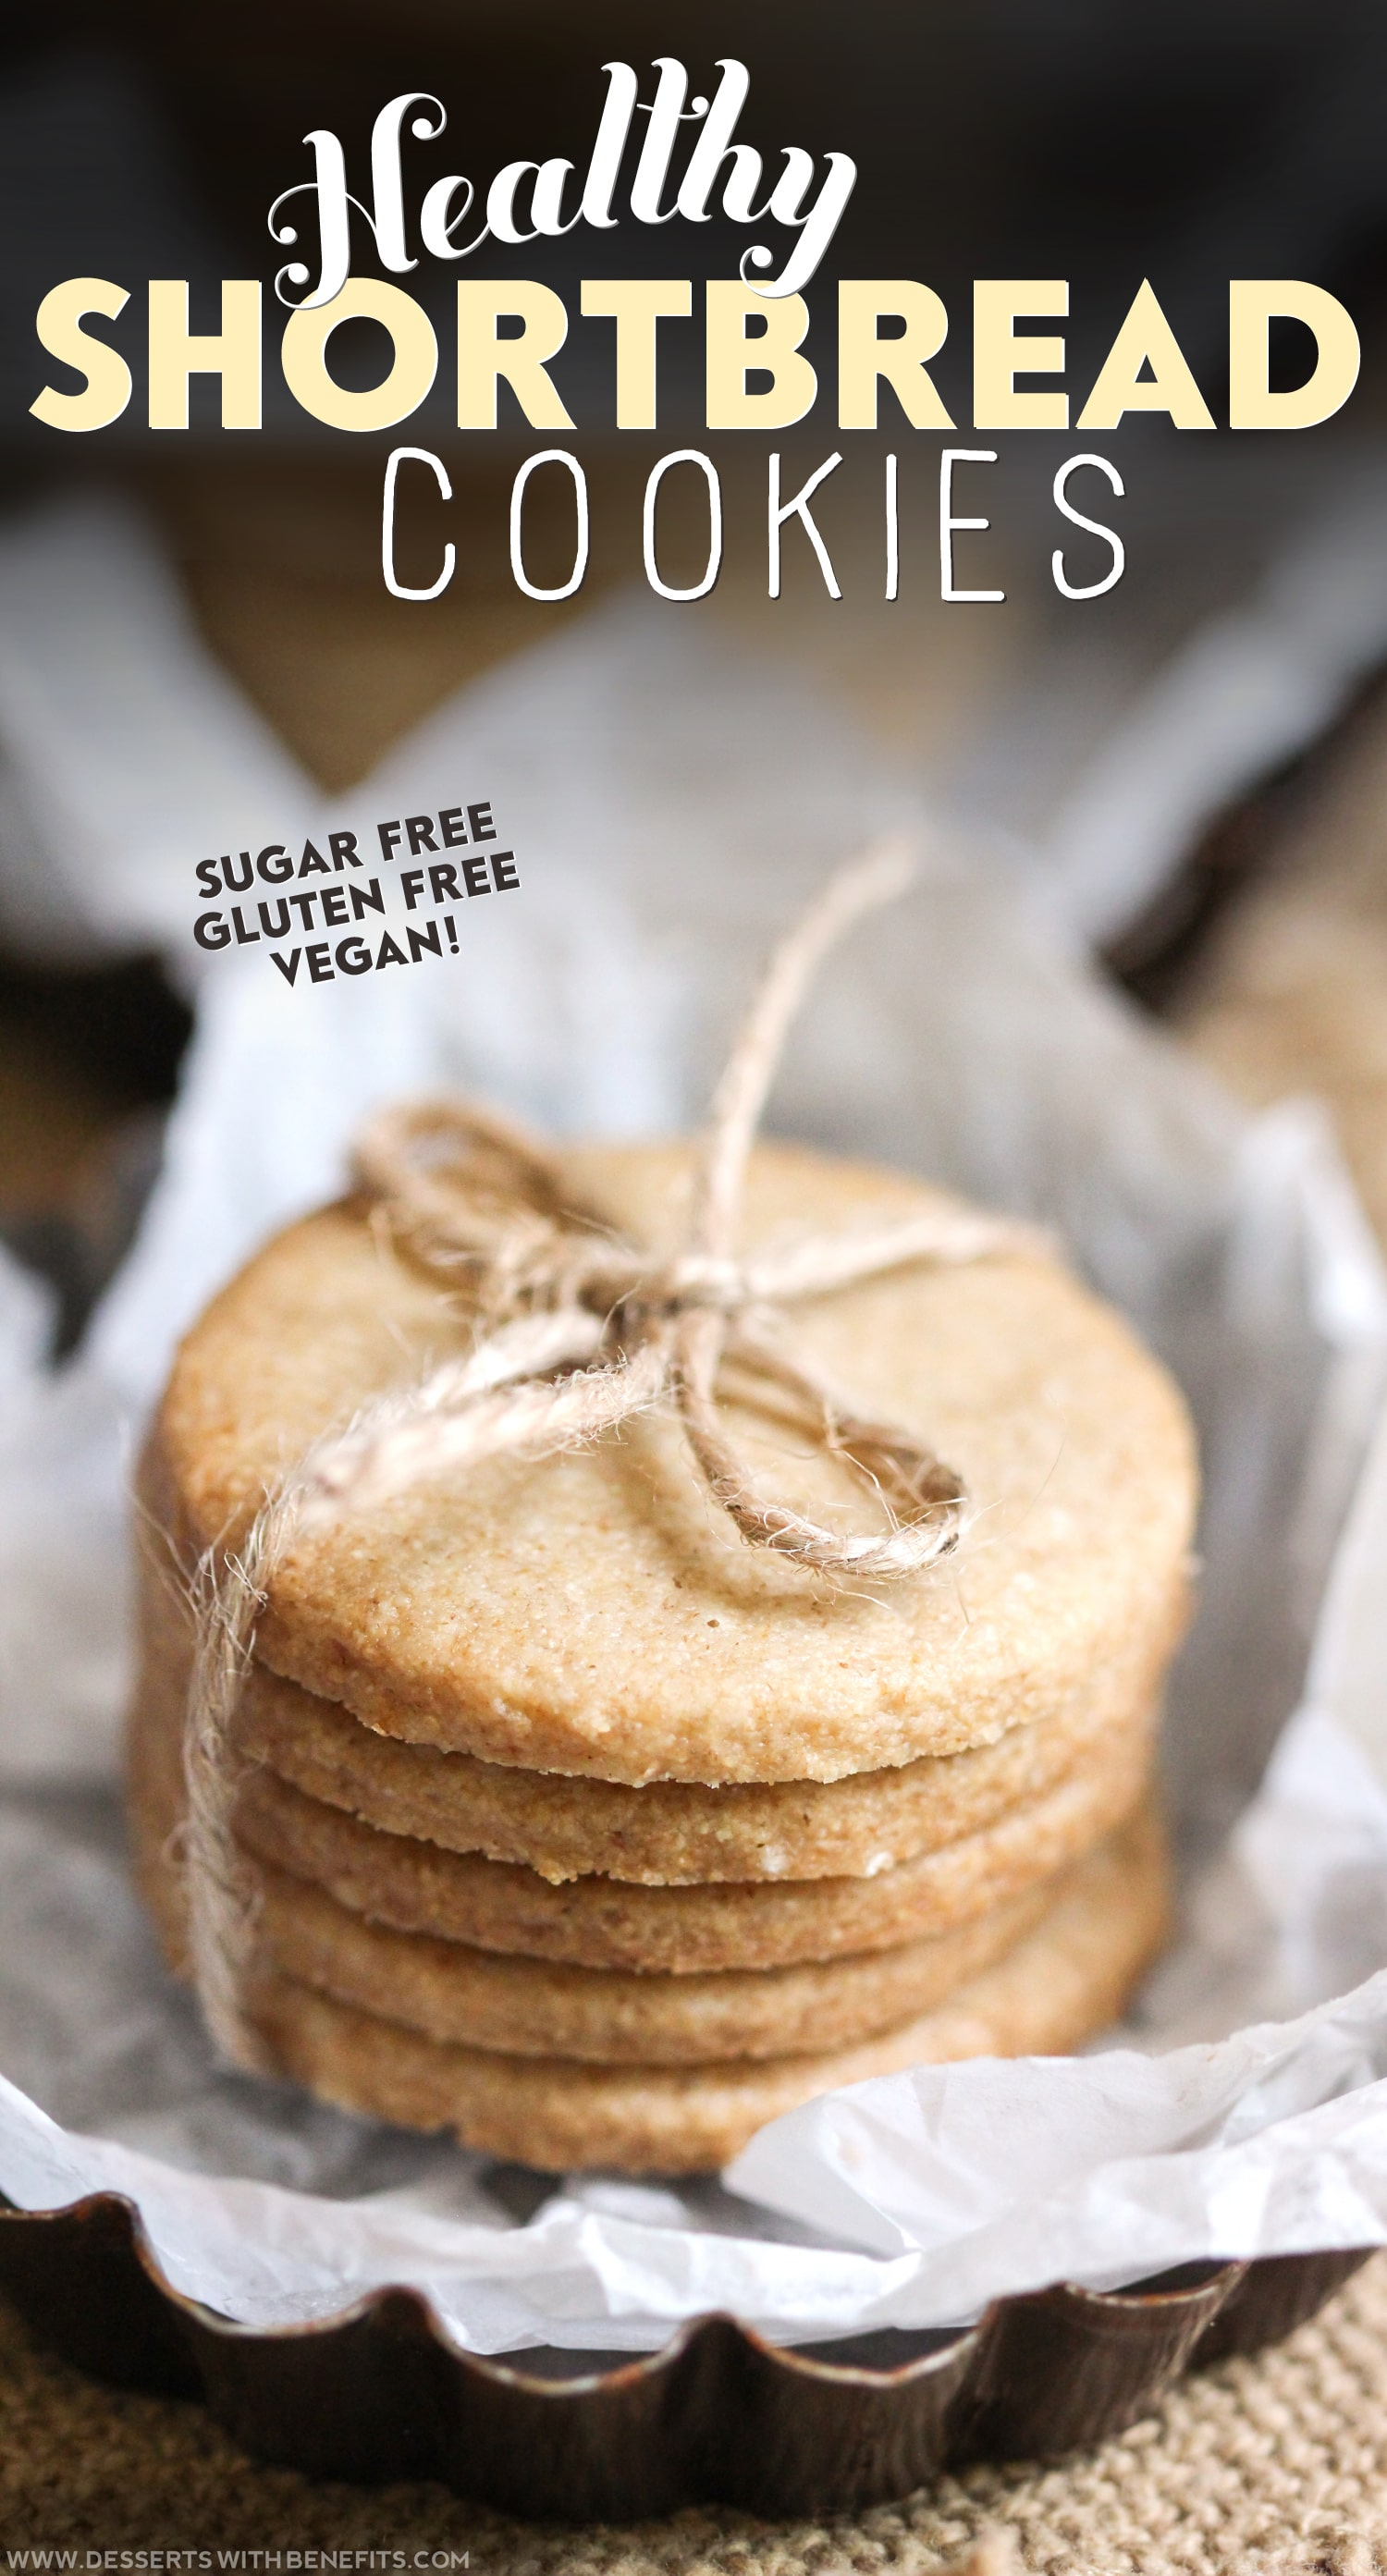 Healthy Shortbread Cookies recipe (refined sugar free, gluten free, dairy free, vegan) - Healthy Dessert Recipes at Desserts with Benefits